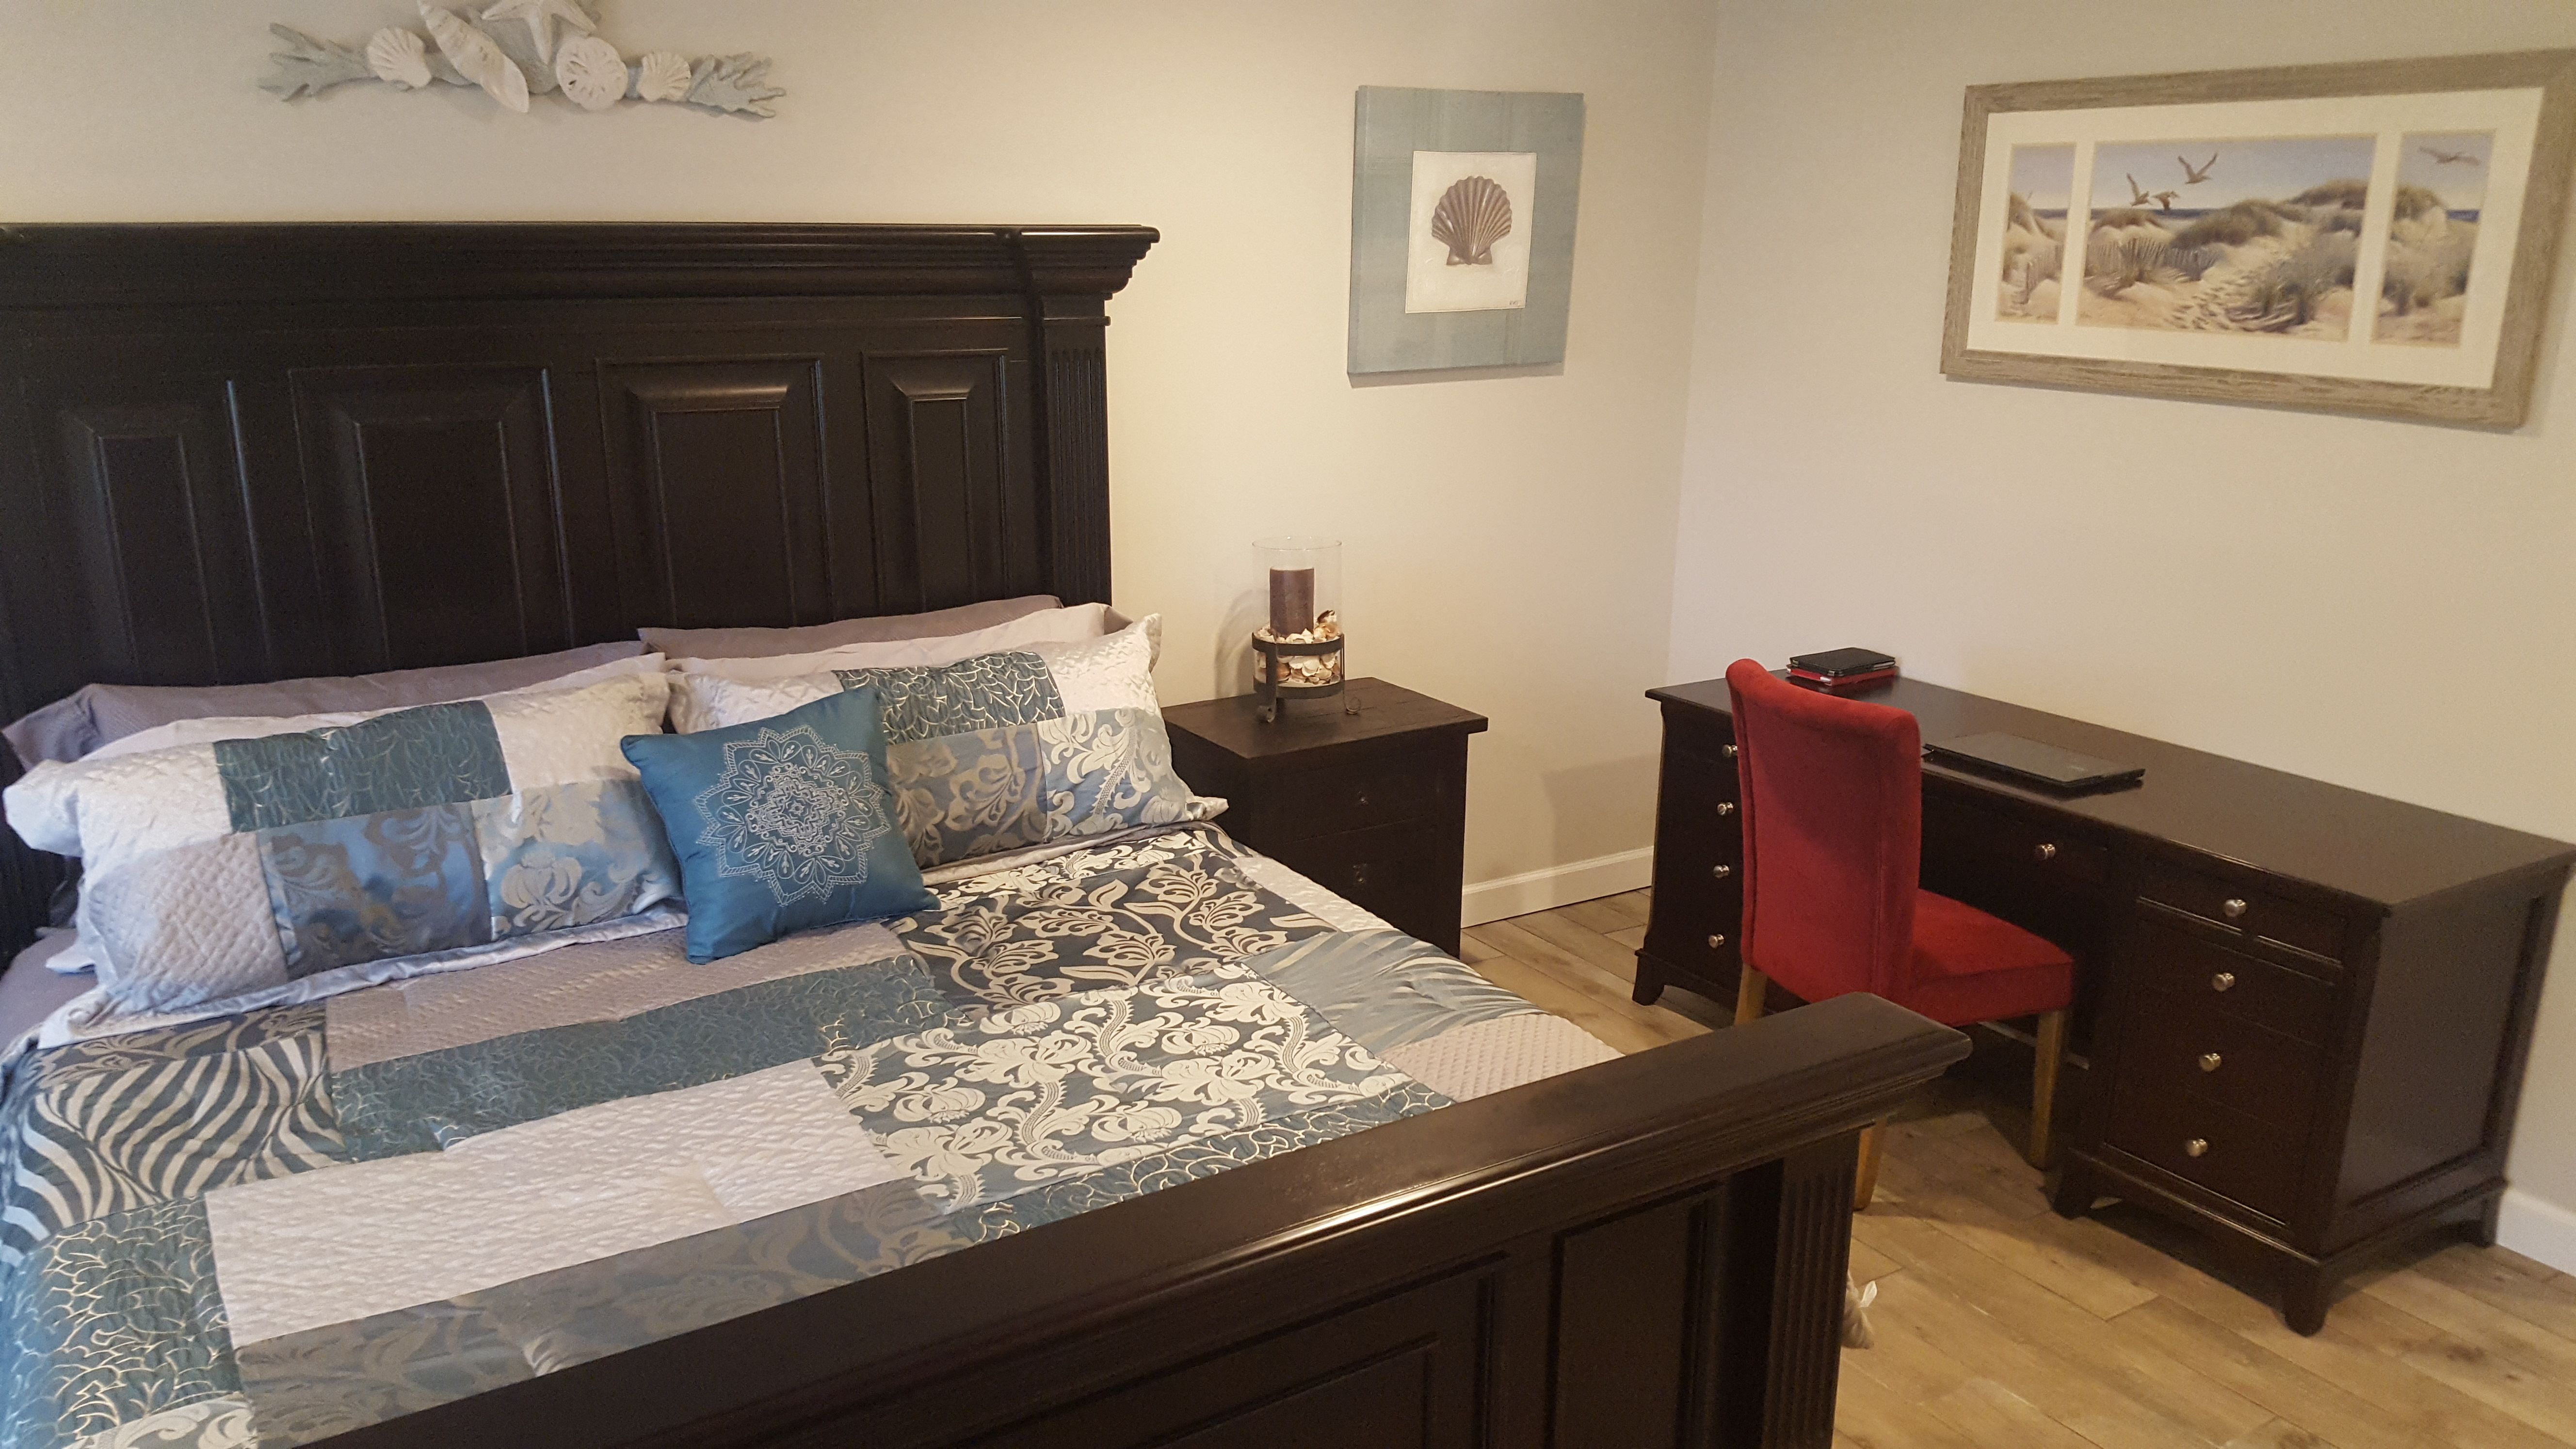 Master bedroom vs owners suite  master bedroom bedding WAYFAIR  Dream Home  Pinterest